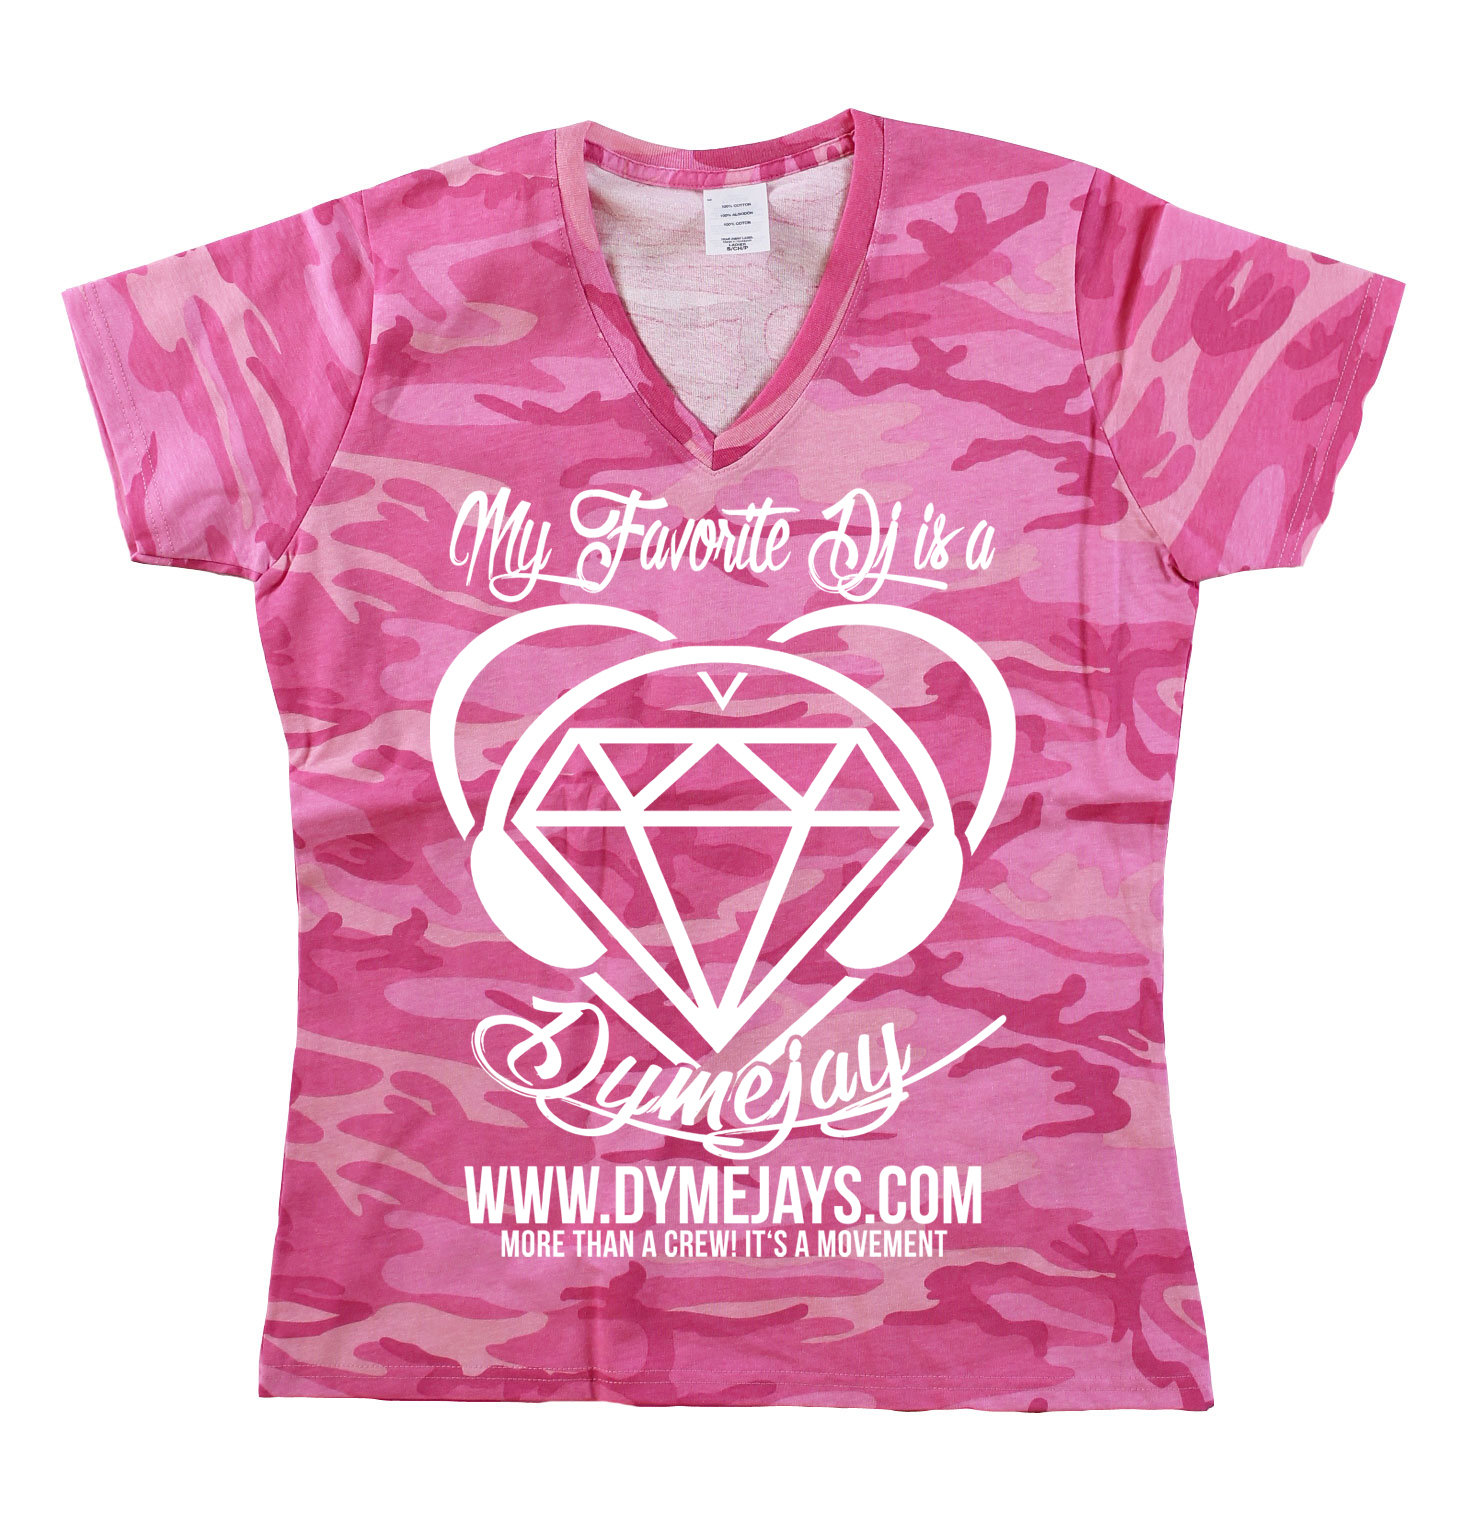 DymeJay Pink Camo Shirt DJPC1